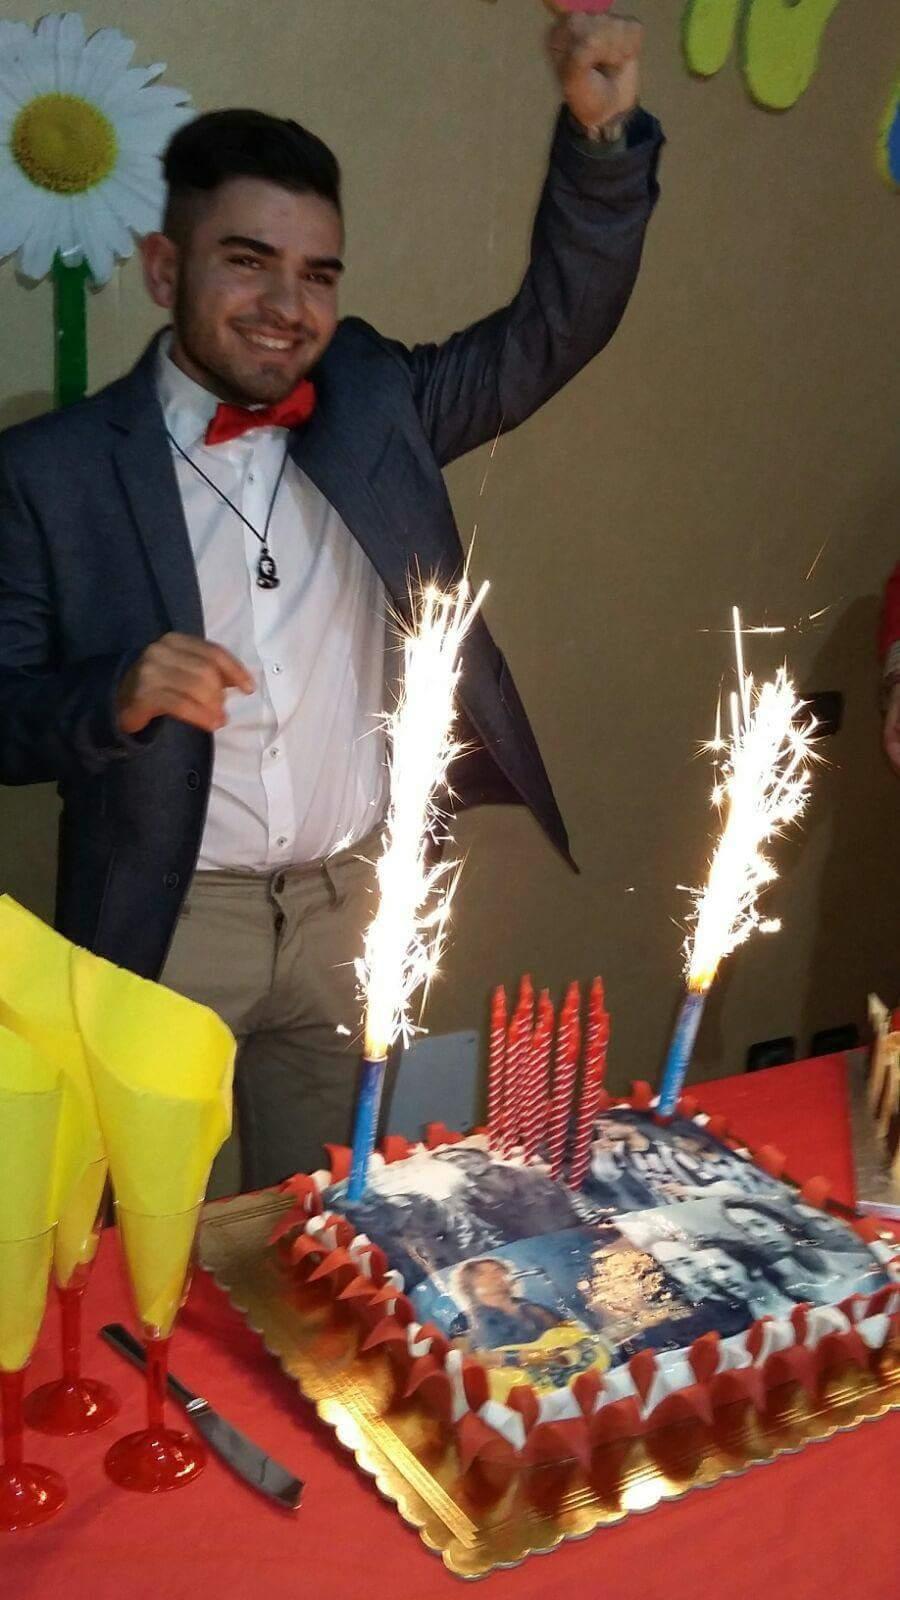 torta con candele accese